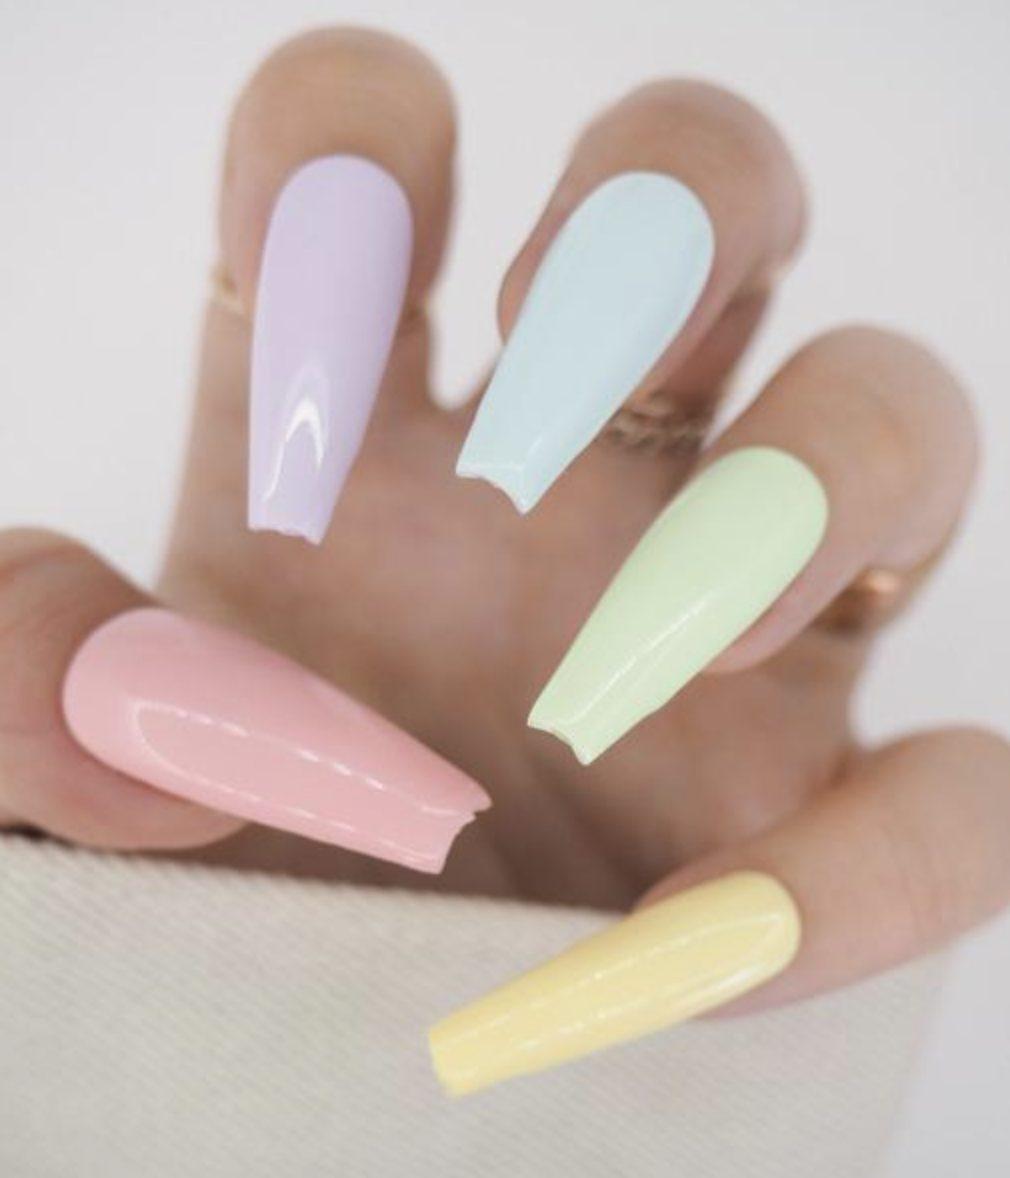 Pastel coffin nails